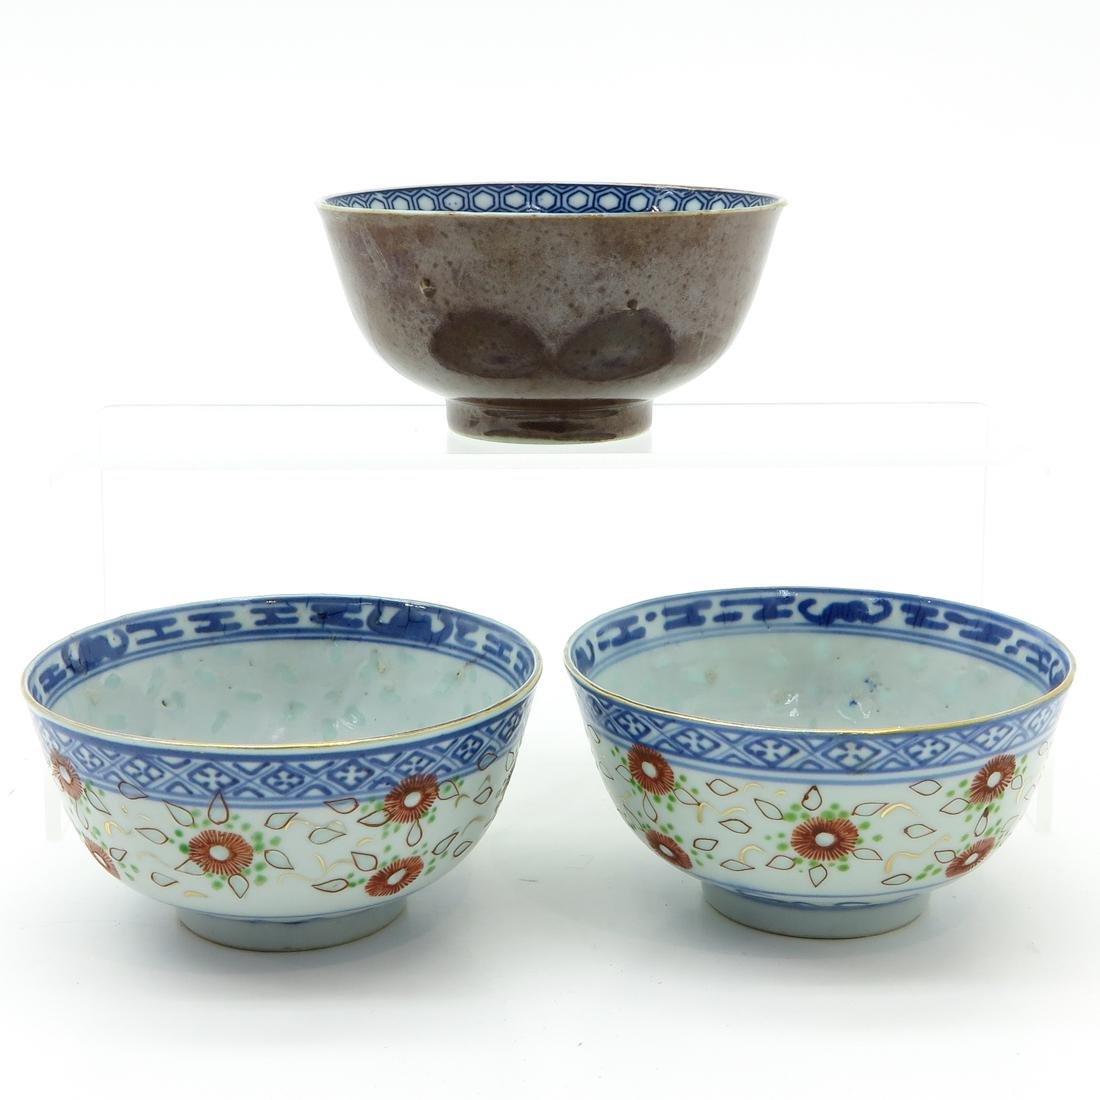 Lot of 3 Bowls